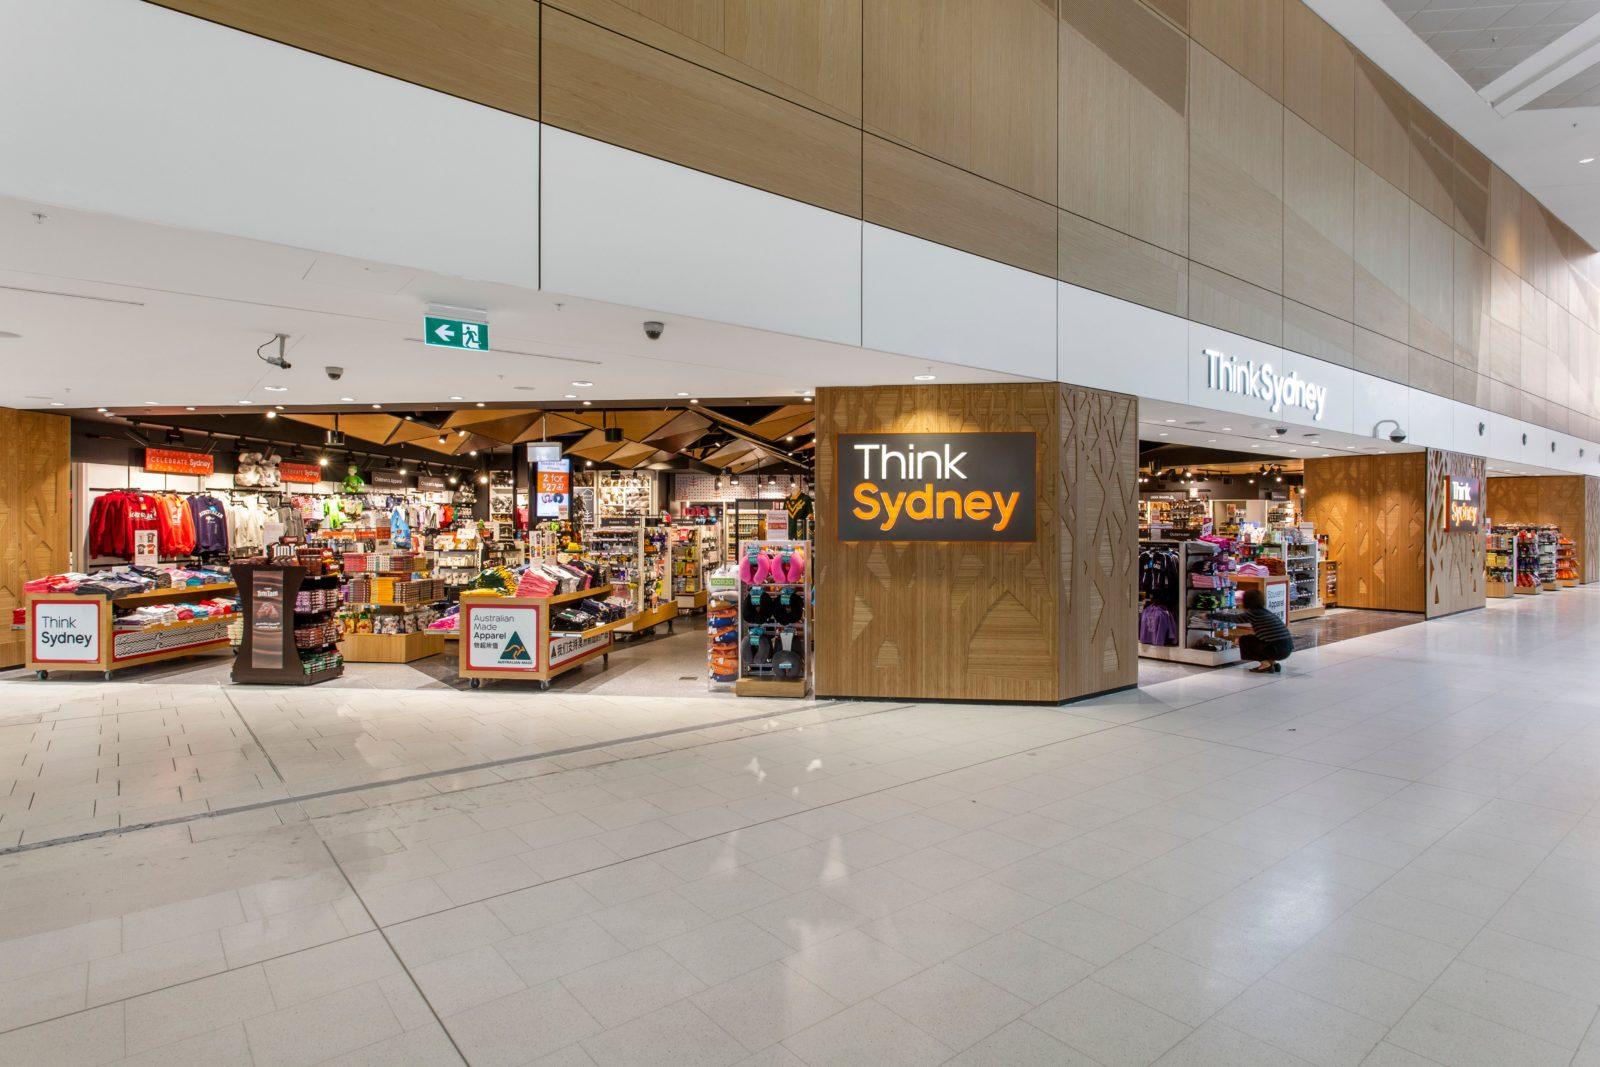 Think Sydney Sydney Airport Pier C Souvenirs Gifts